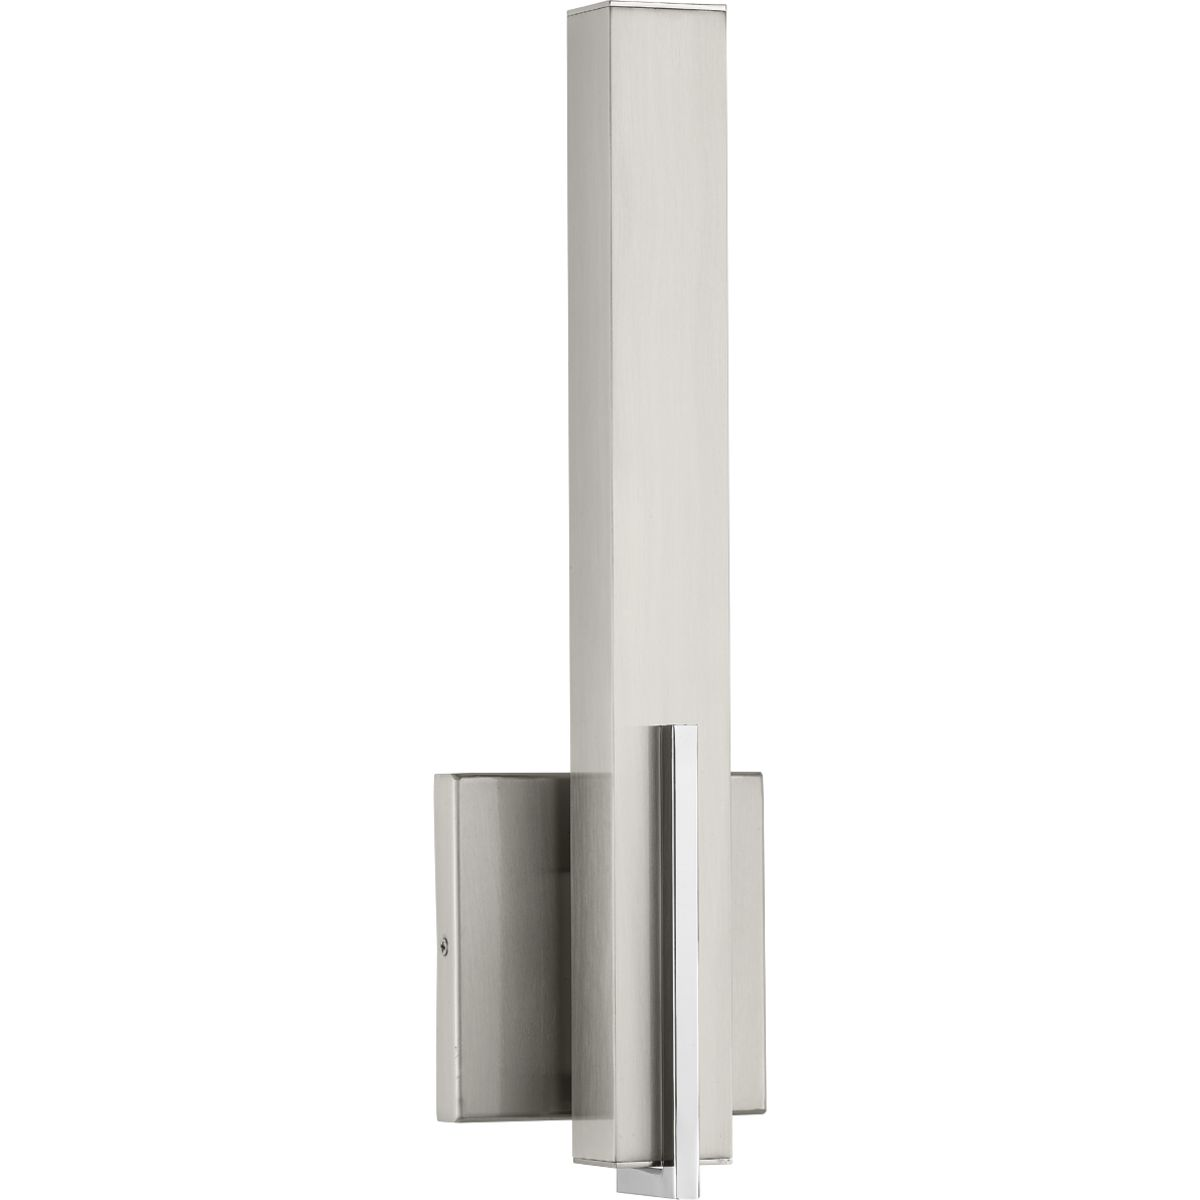 Planck LED Collection One-Light LED Wall Sconce, Brushed ... on Led Sconce Lighting id=34259